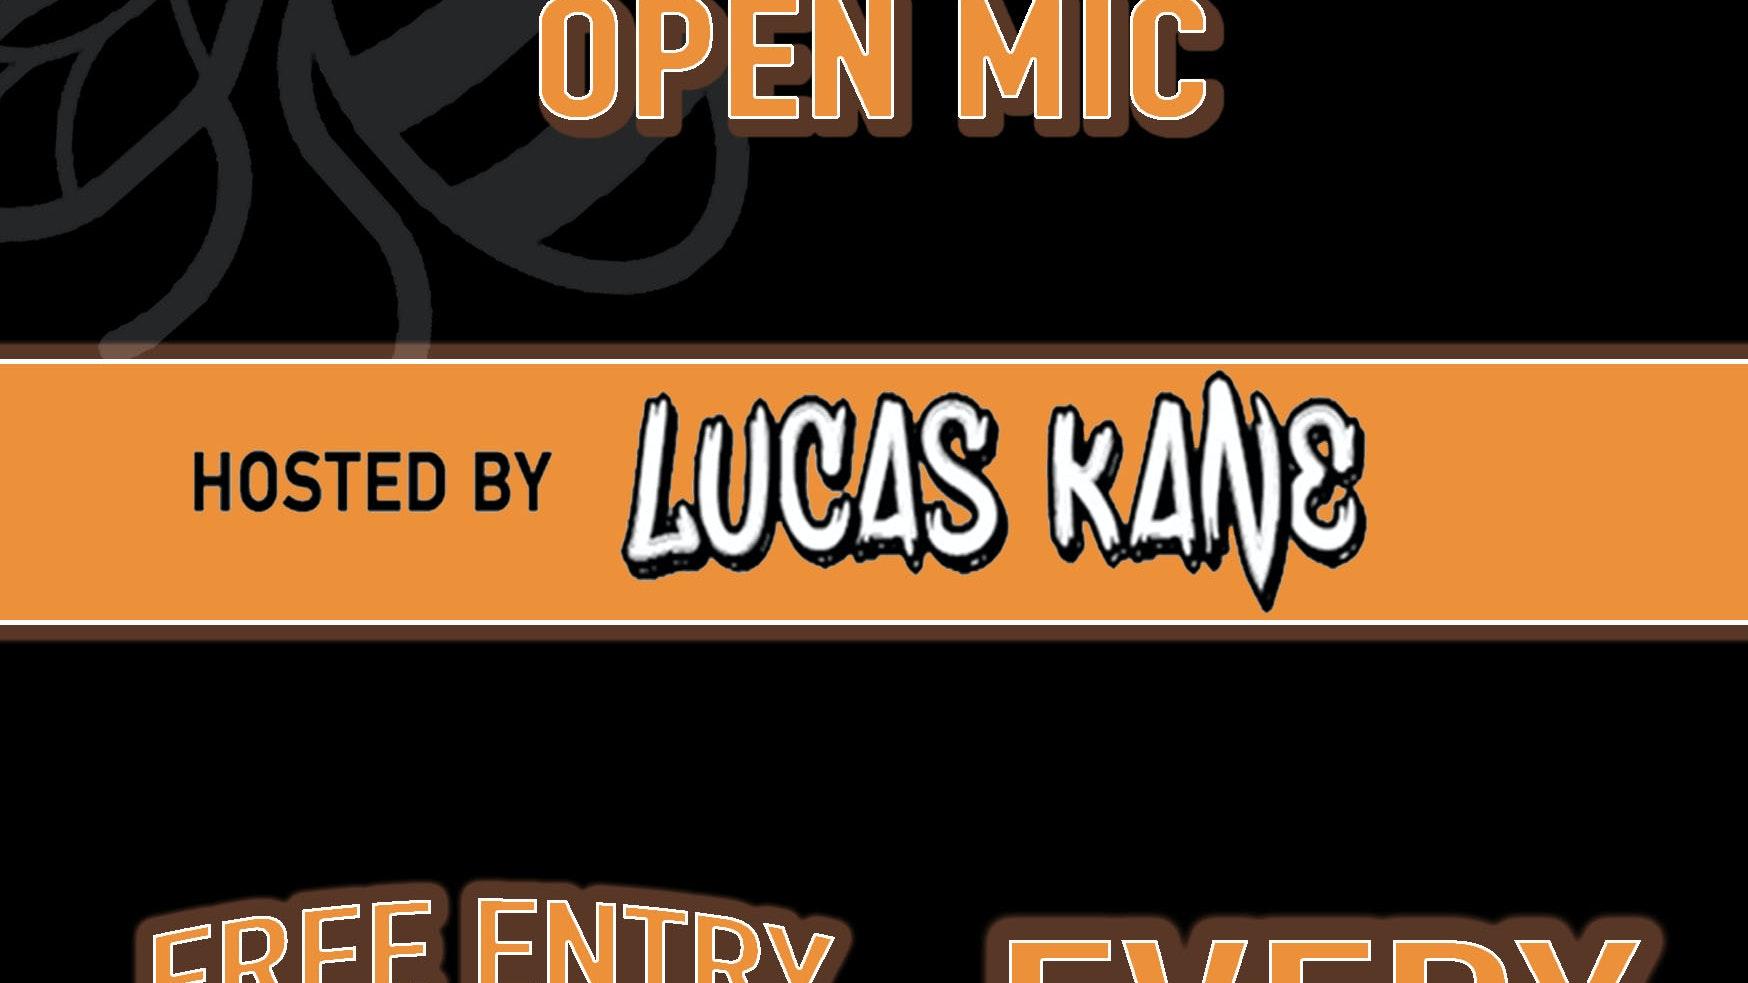 BRAND NEW Open mic at Retro